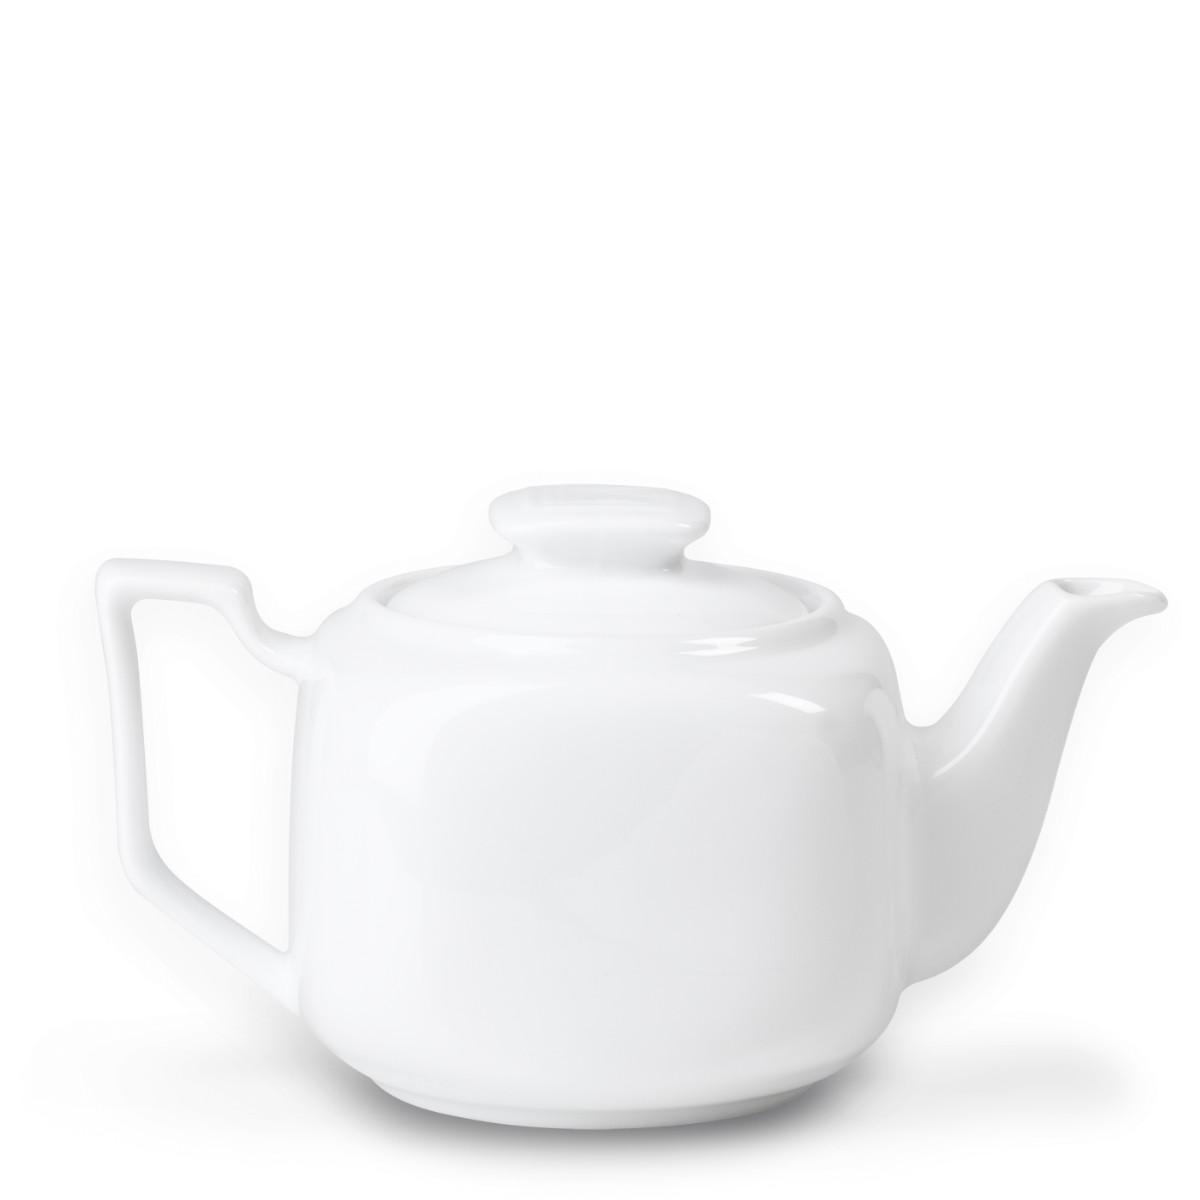 Althaus Tee Kanne